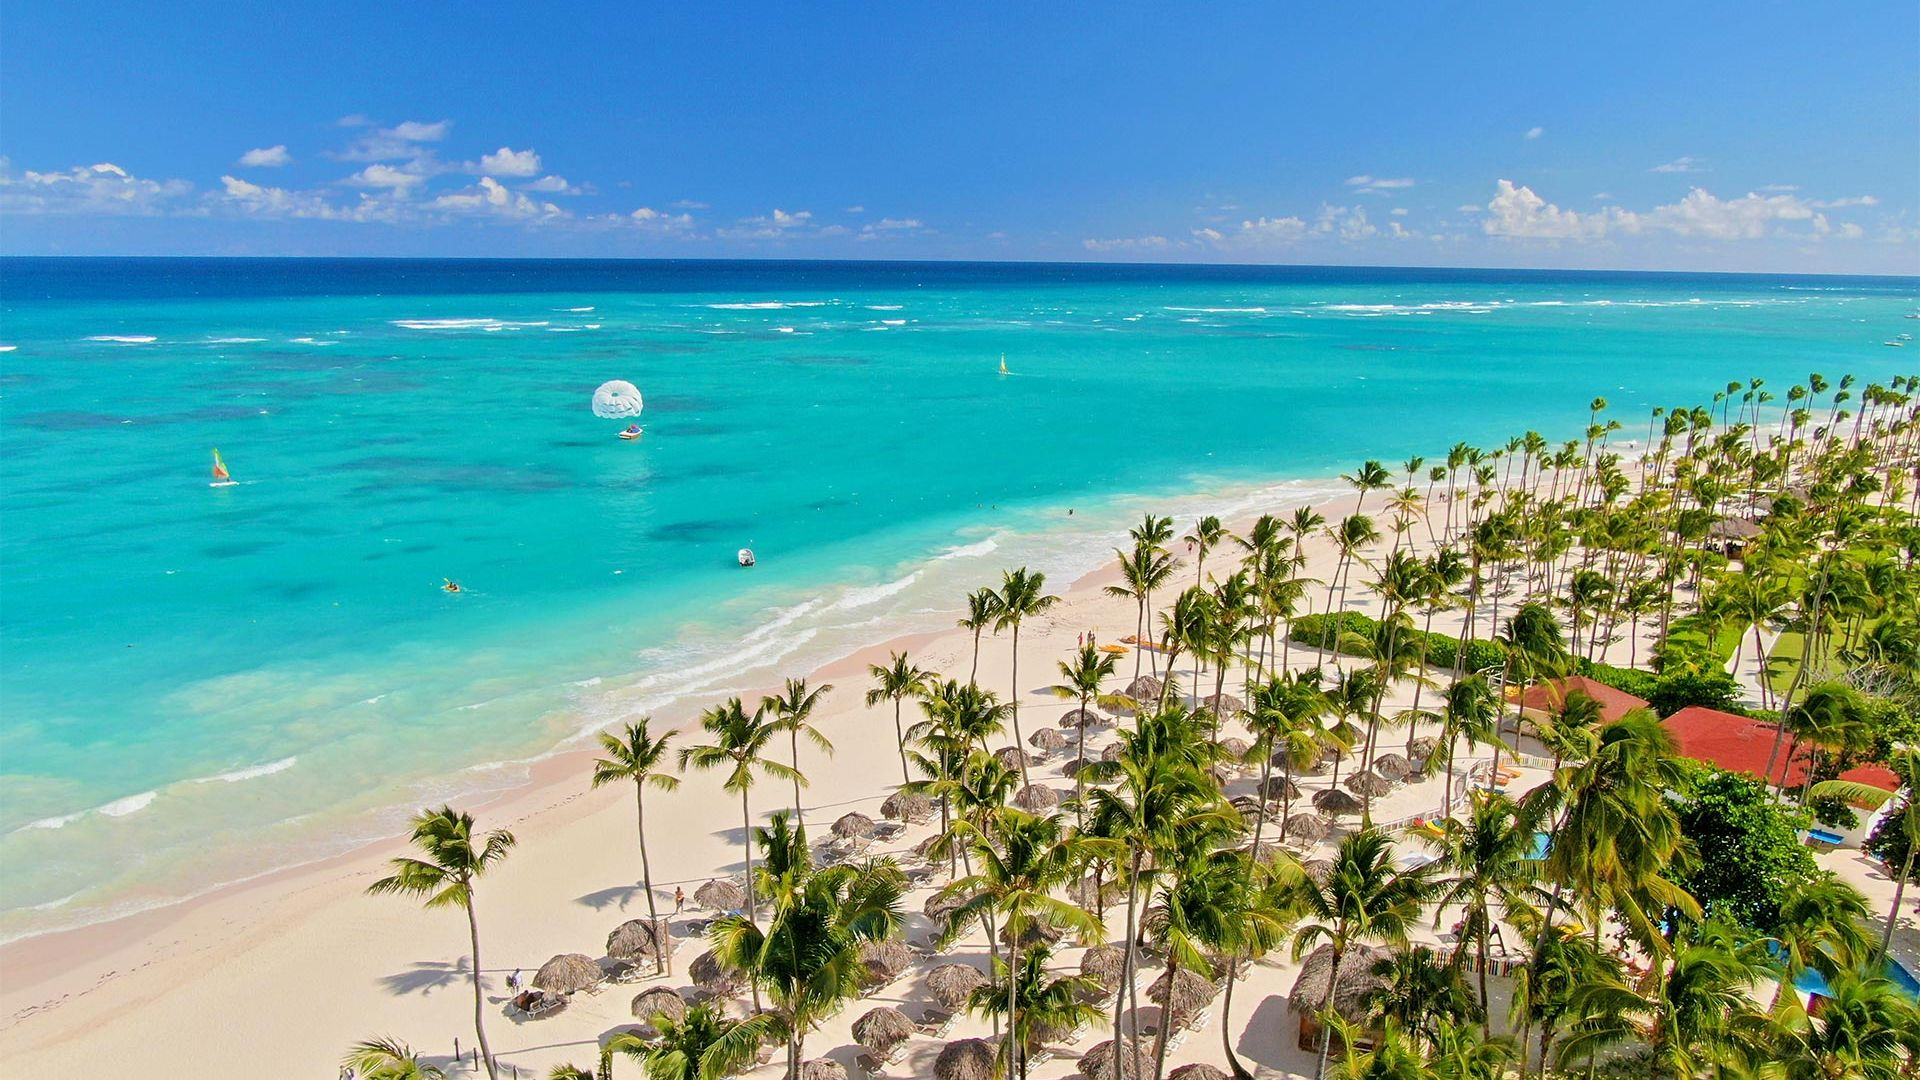 Sejur charter Bahia Principe Resort Punta Cana, 9 zile - ianuarie 2022